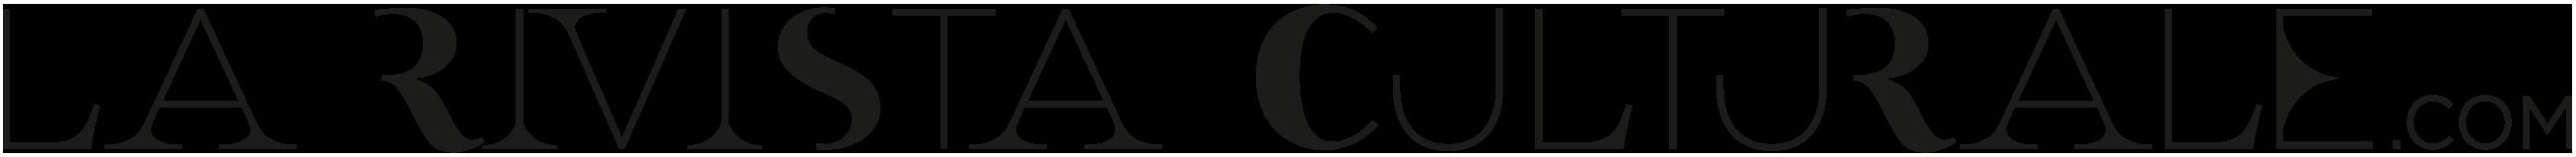 LaRivistaCulturale.com Logo